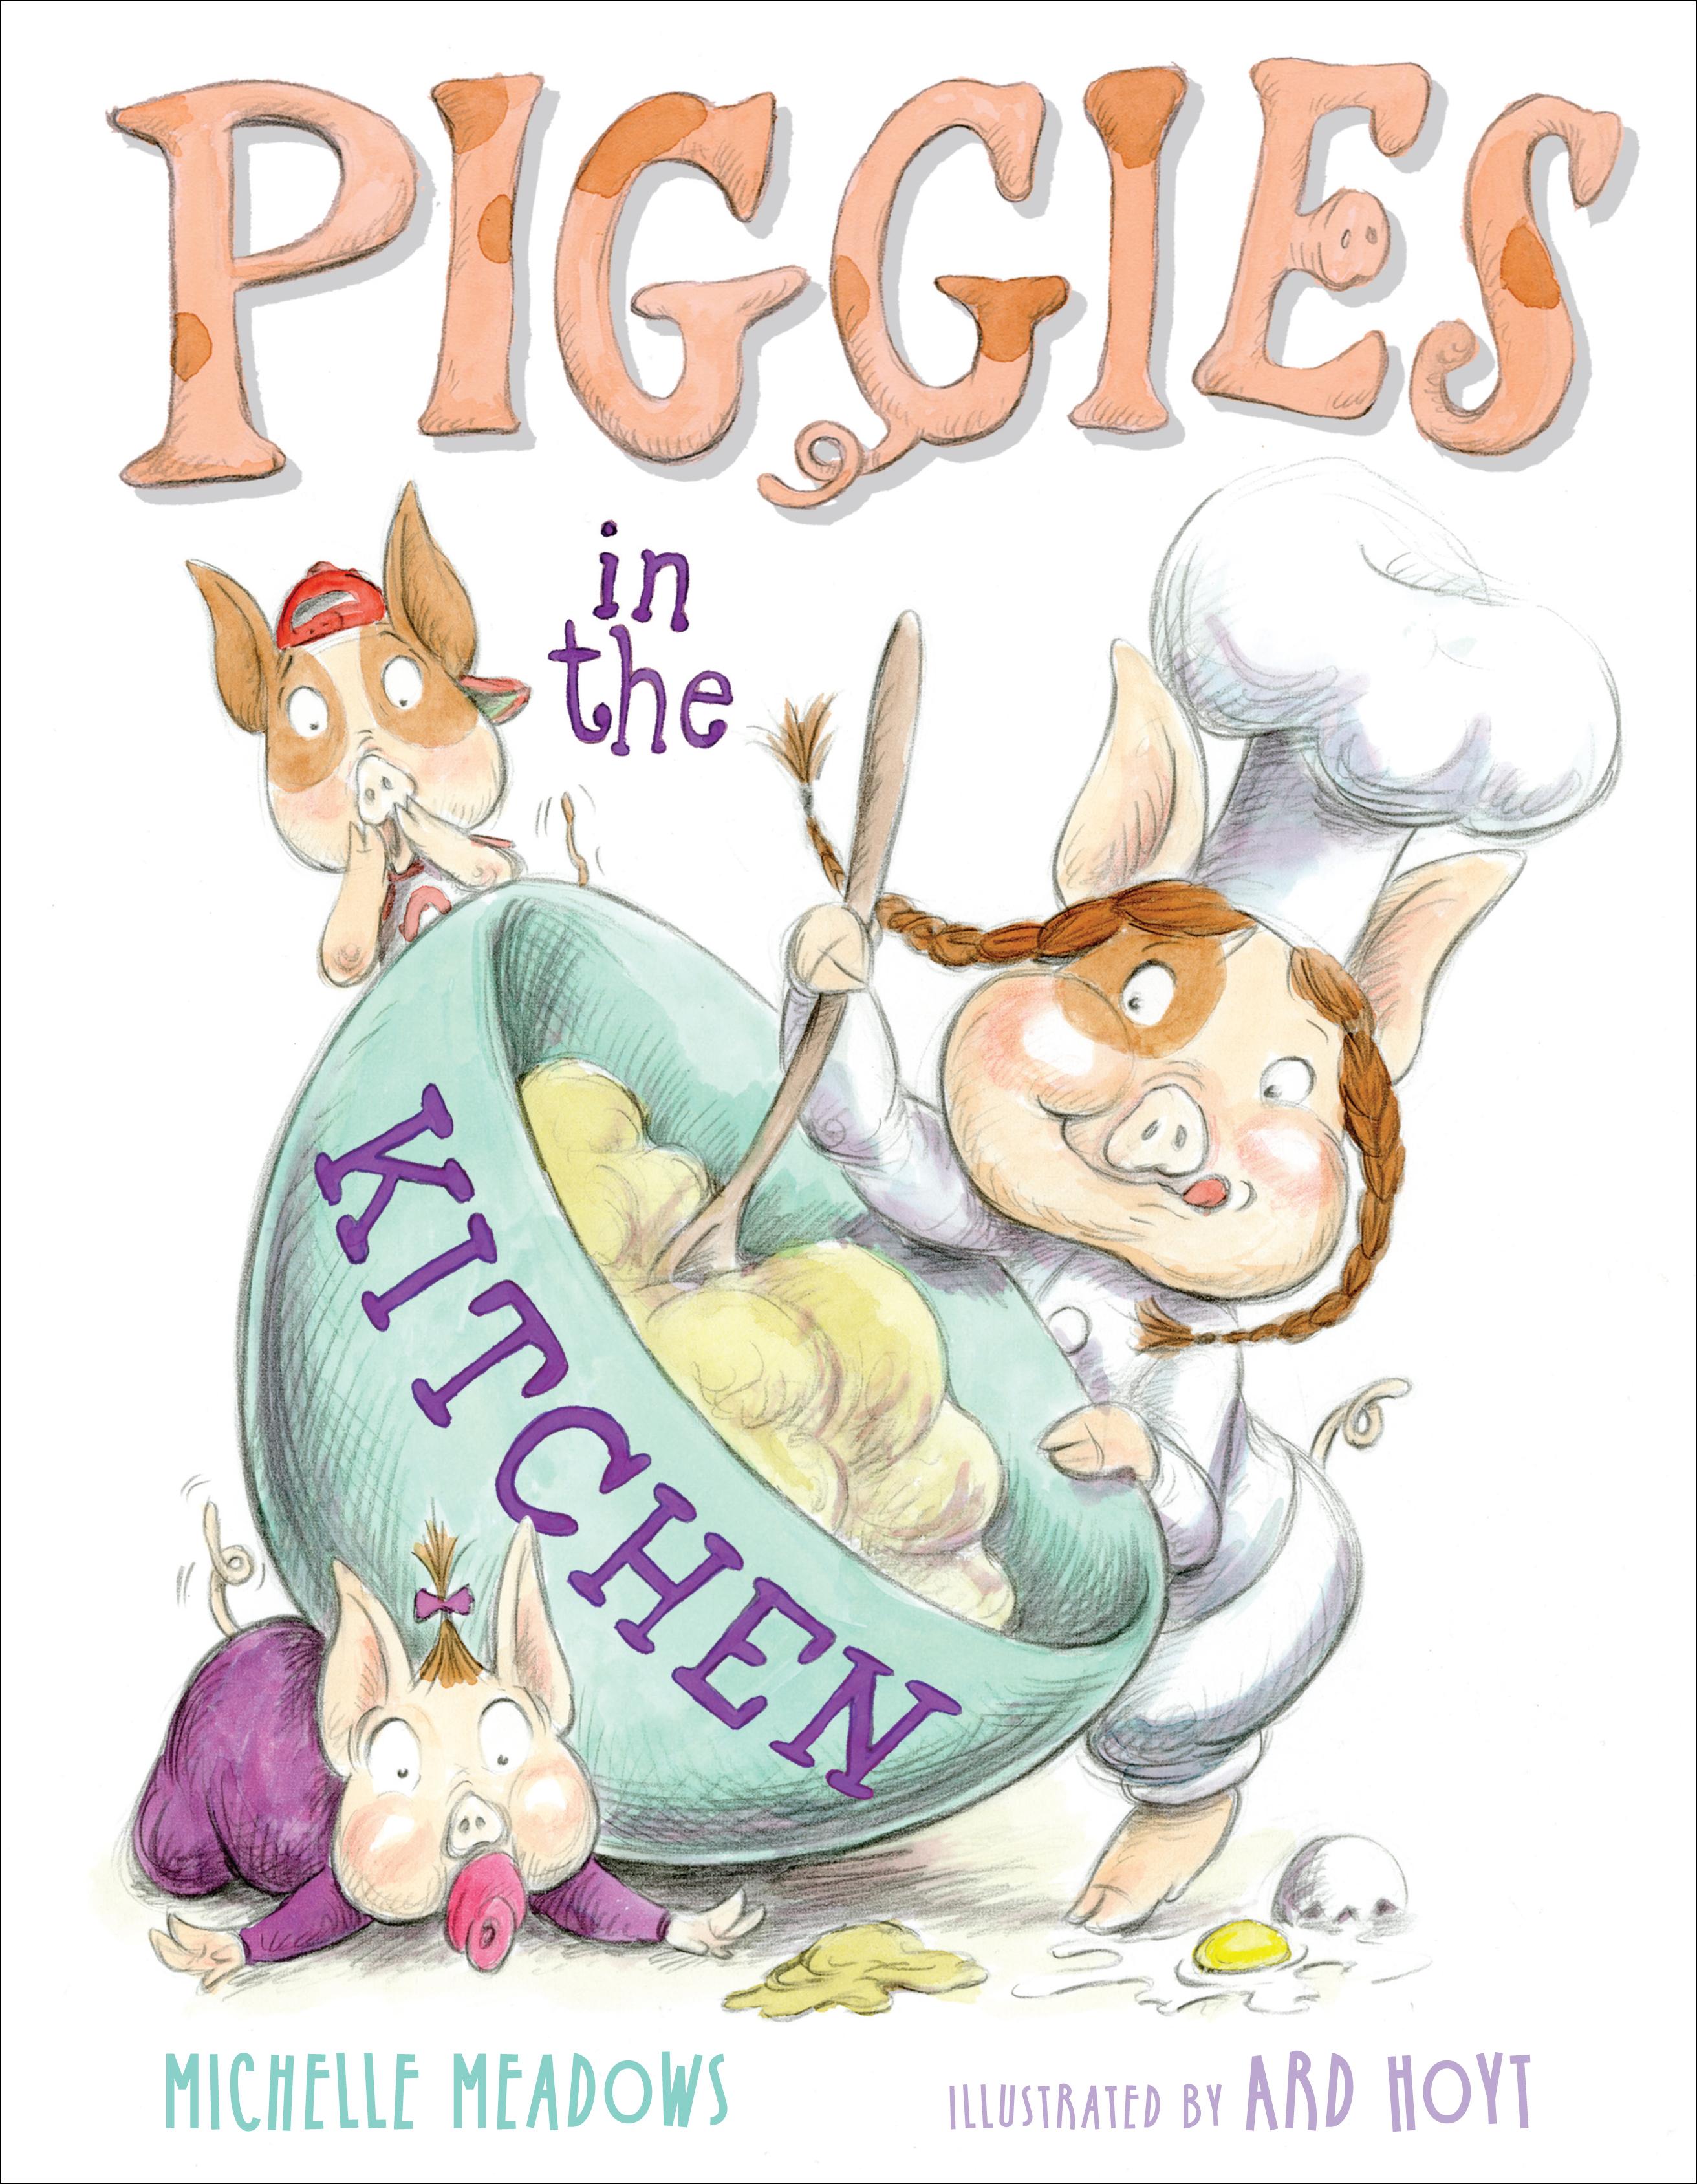 Piggies in the kitchen book by michelle meadows ard hoyt cvr9781416937876 9781416937876 hr piggies fandeluxe Image collections